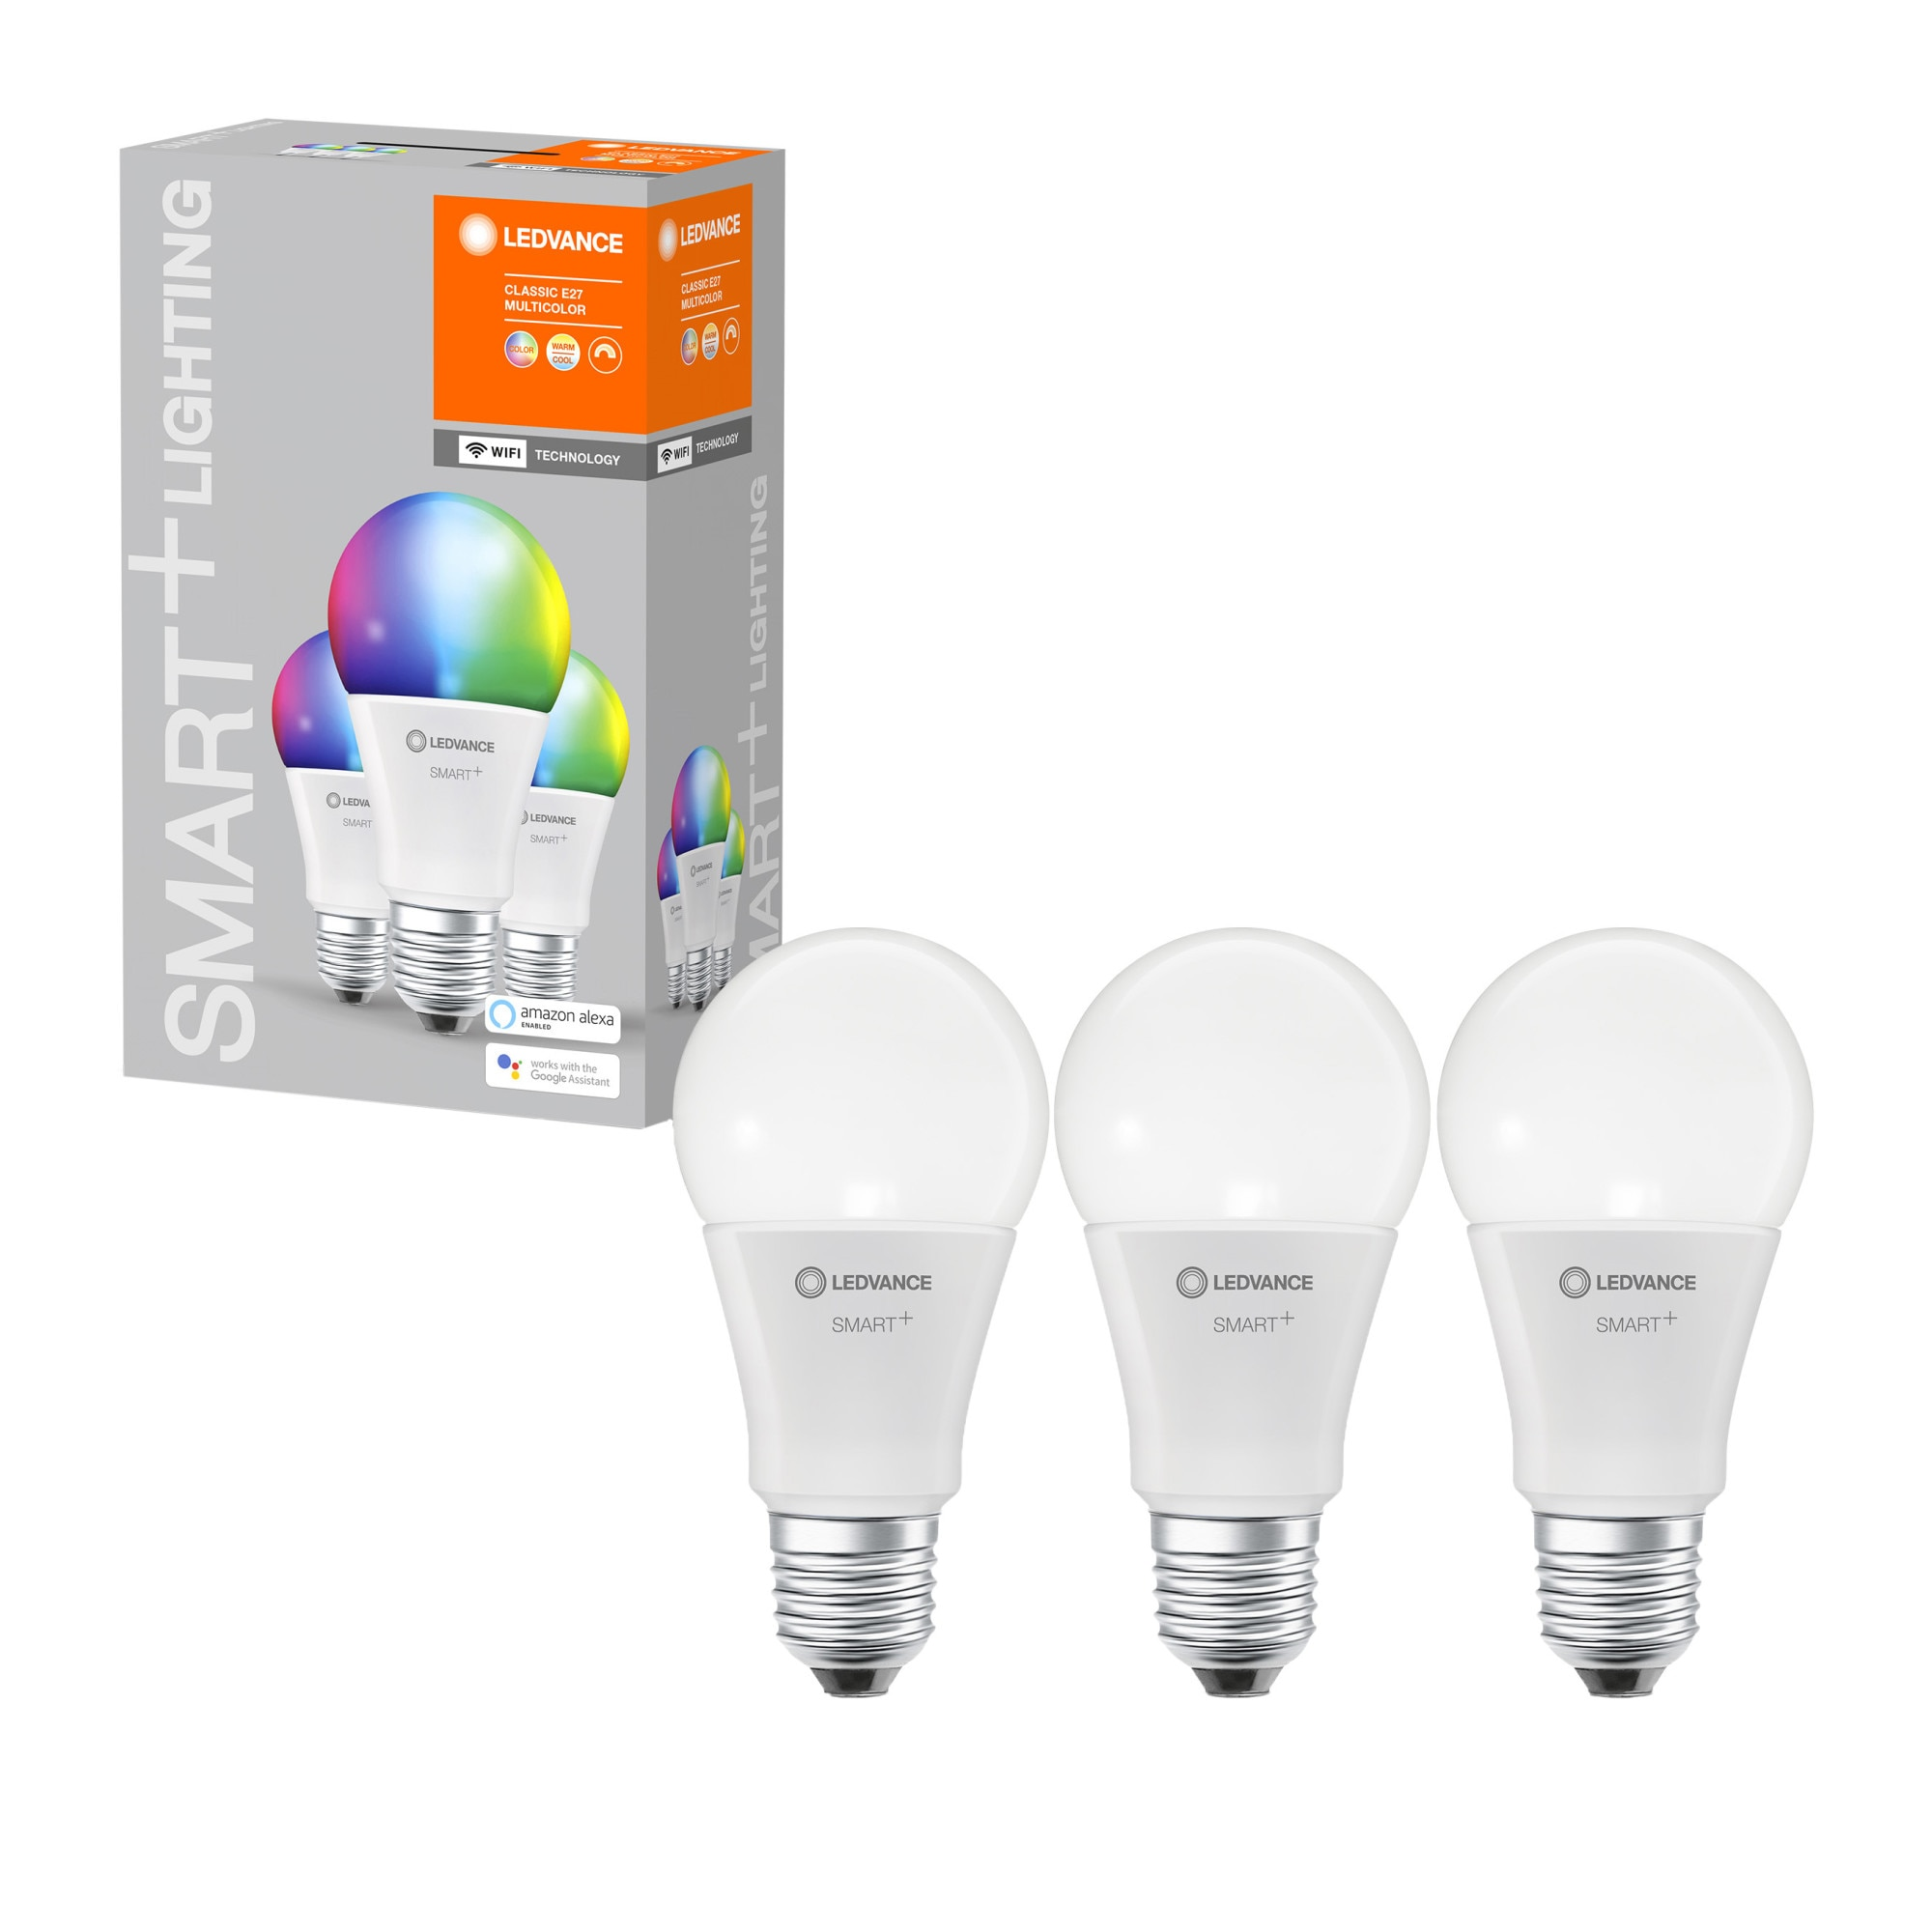 Fotografie Pachet 3 becuri inteligente LED RGBW LEDVANCE SMART WIFI, A60, E27, 9W (60W), 806 lm, dimabil, lumina alba si colorata, compatibil amazon alexa/Google Assistant